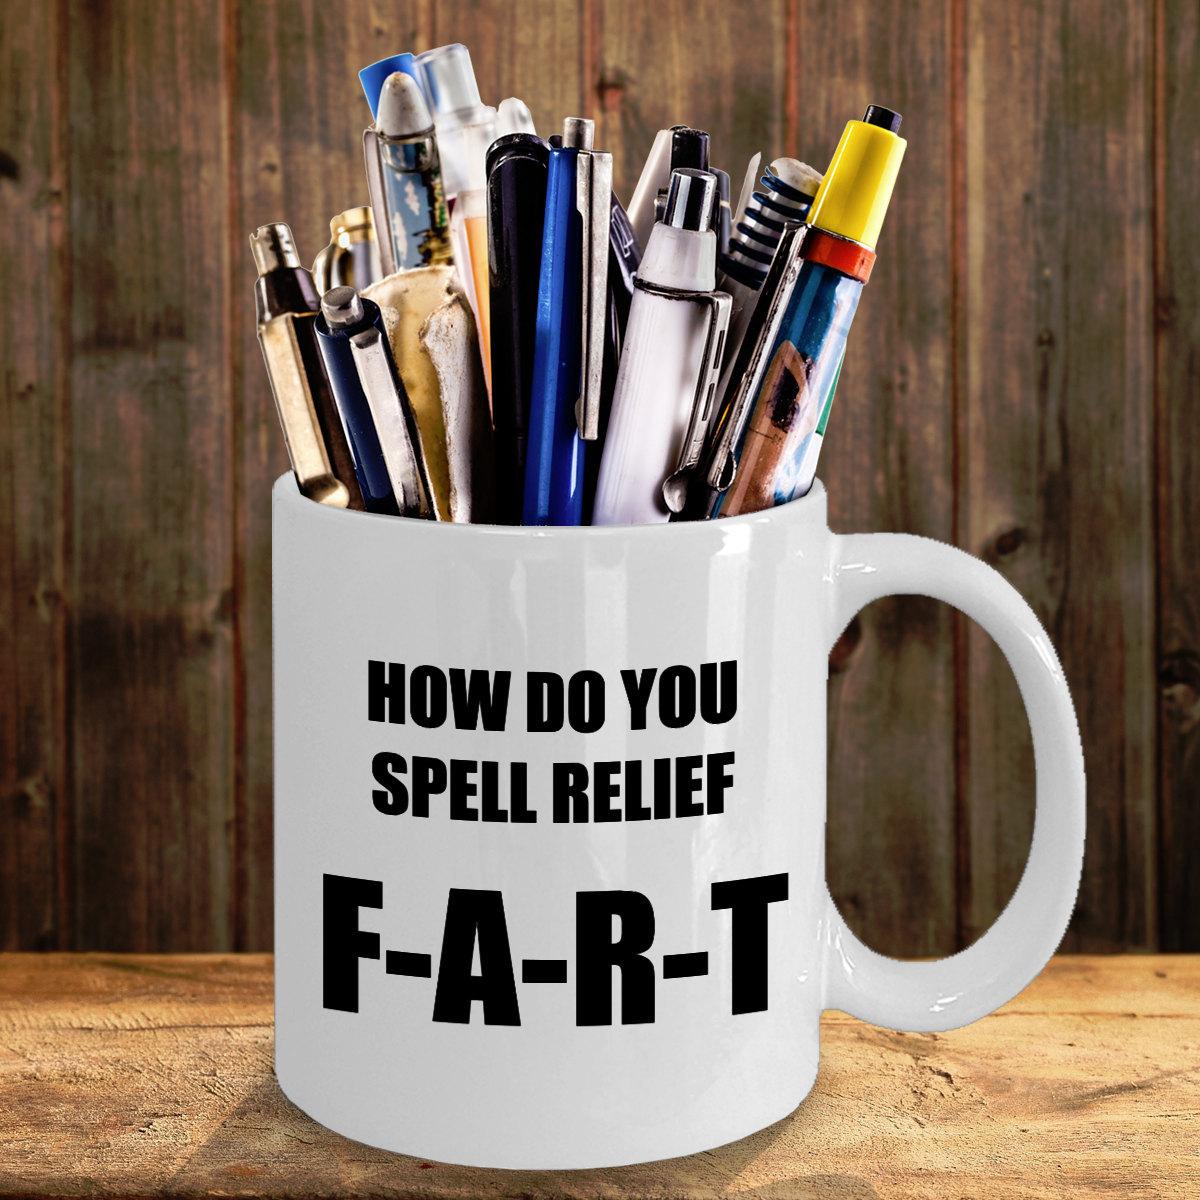 Funny Fart Coffee Mug Birthday Personalized Gift For Him Her Men Women Dad Mom F